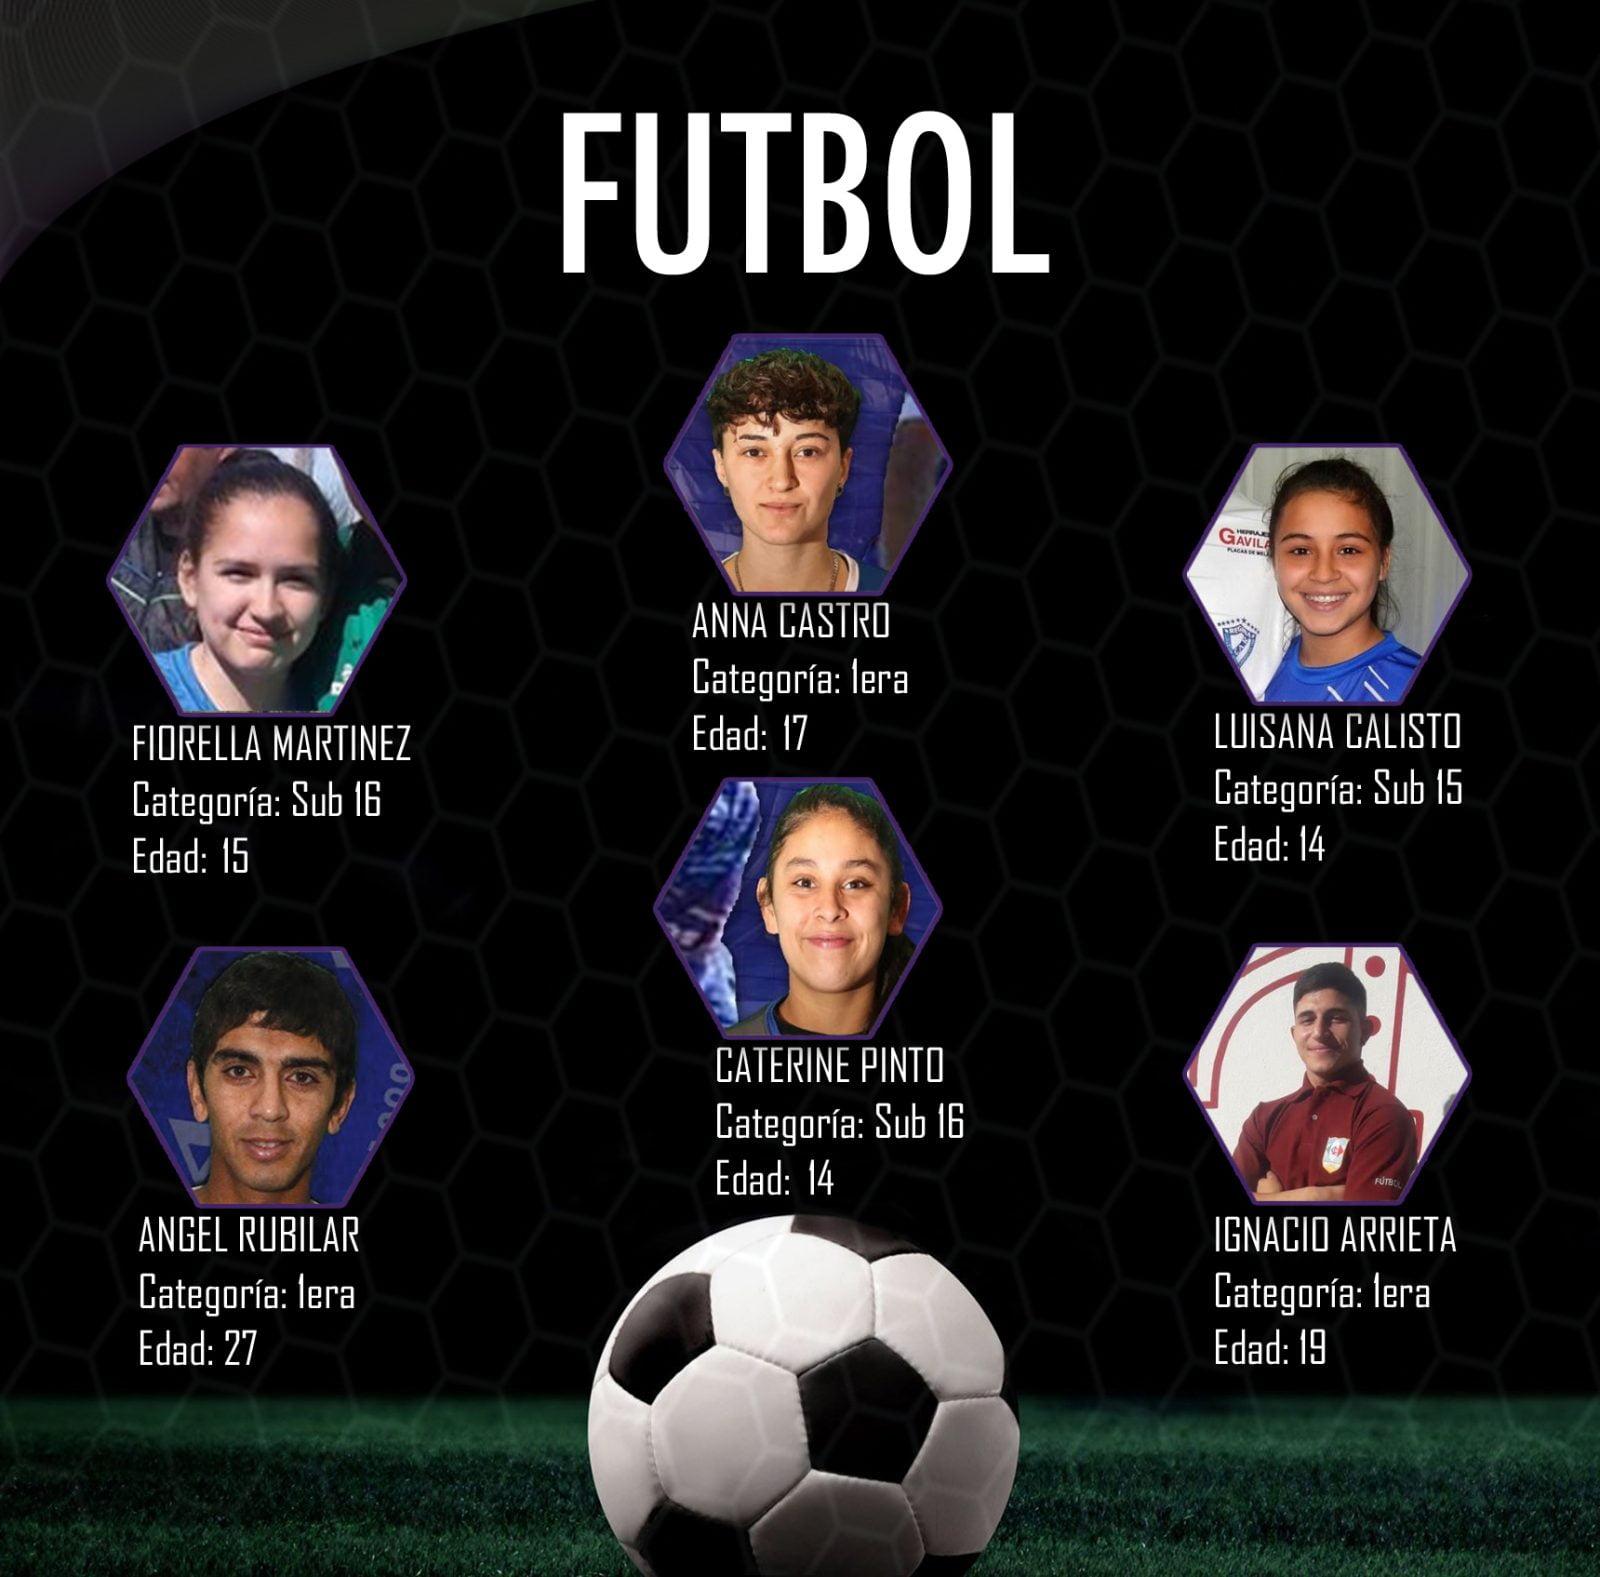 PREMIOS DIGITALES DEPORTIVOS E-TAPAS 2019/FUTBOL